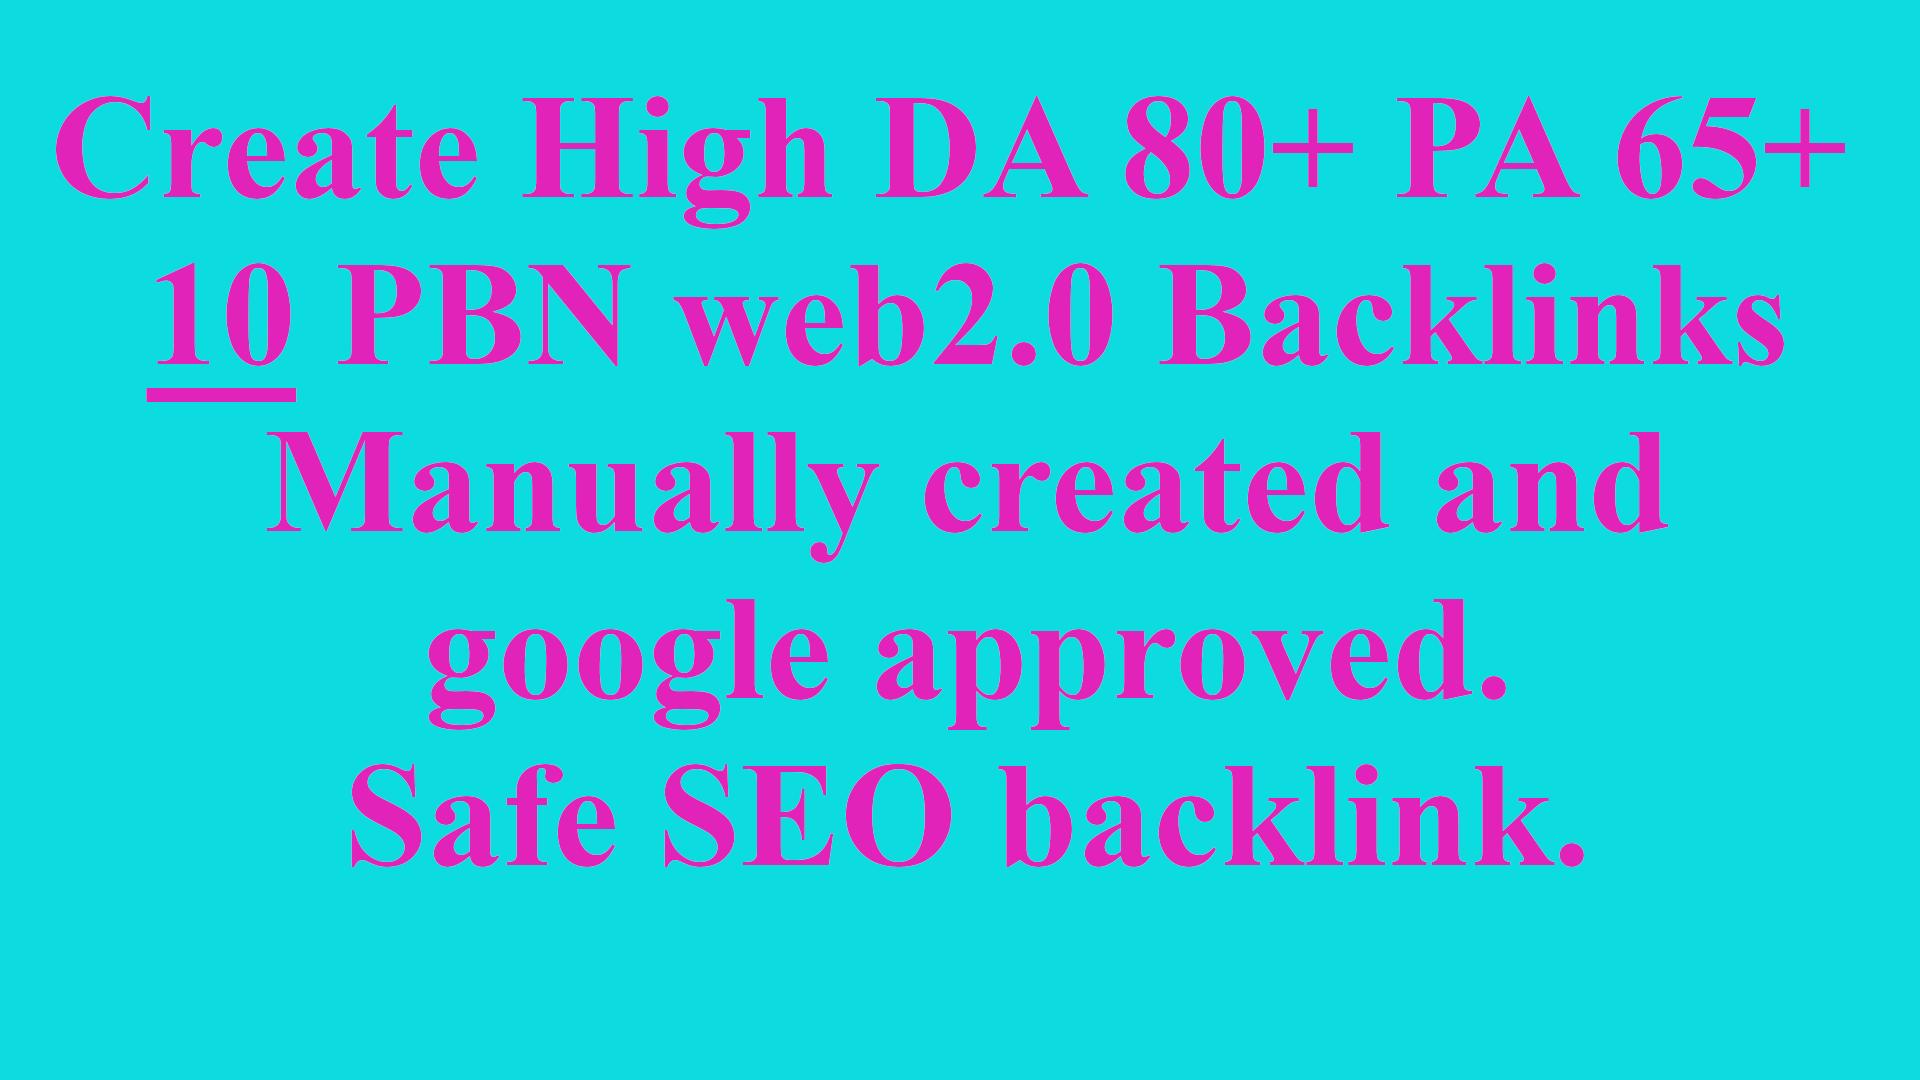 Web 2.0 10 PBN Unique Sites DA 80+ PA 65+